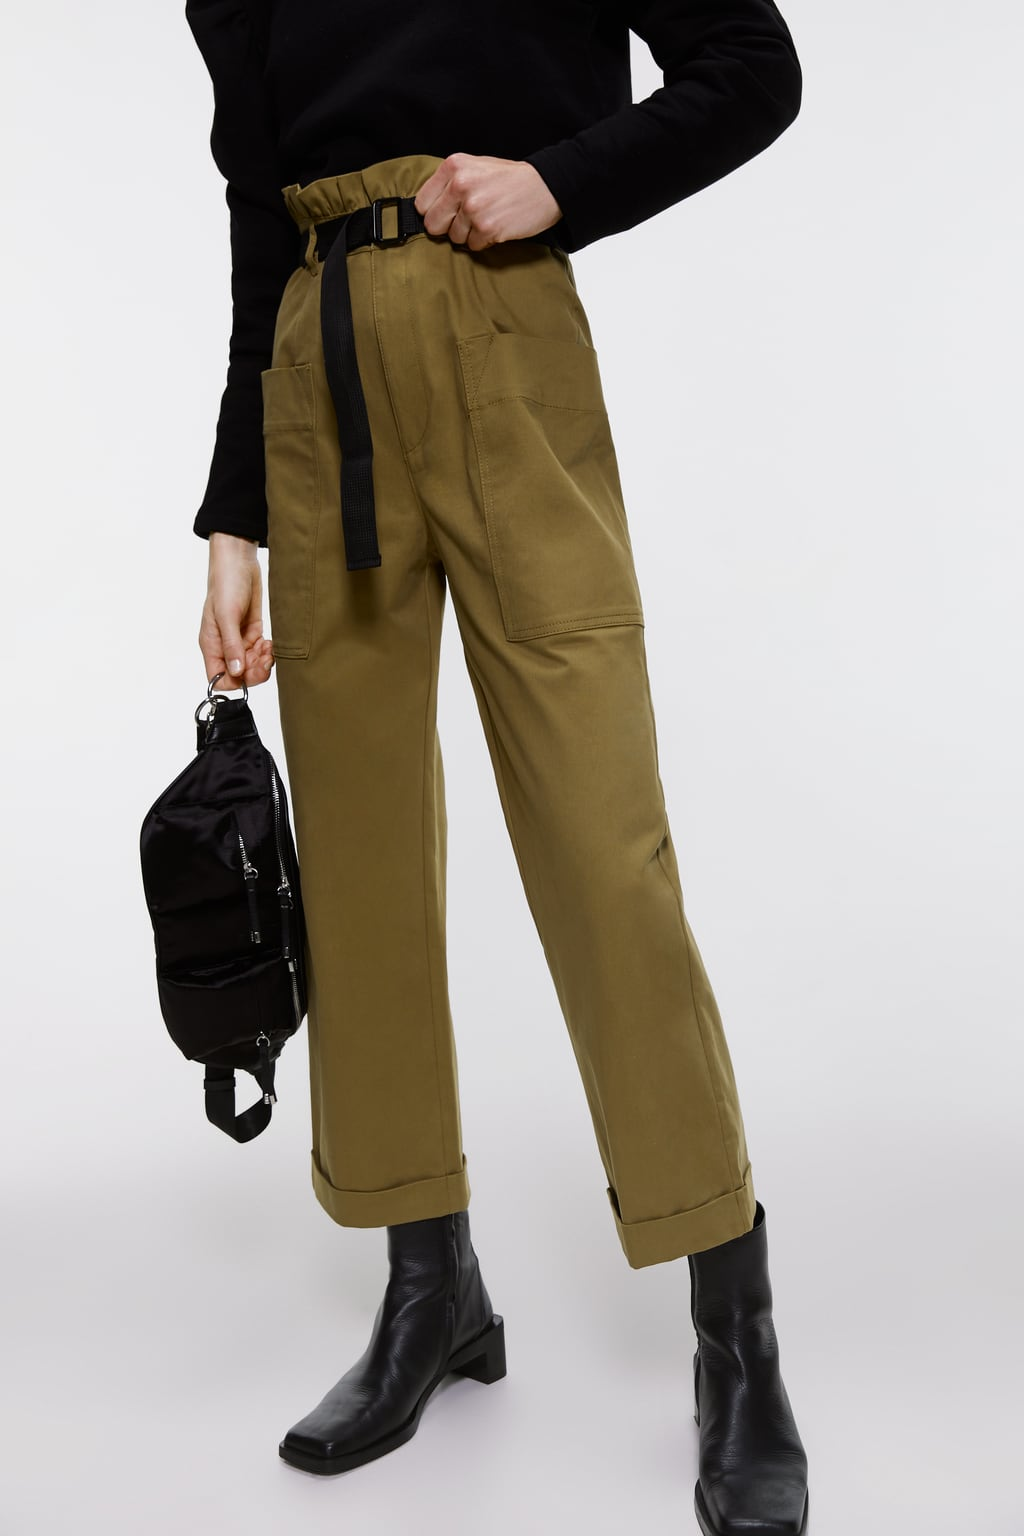 ZARA_ pantalon ceinturé